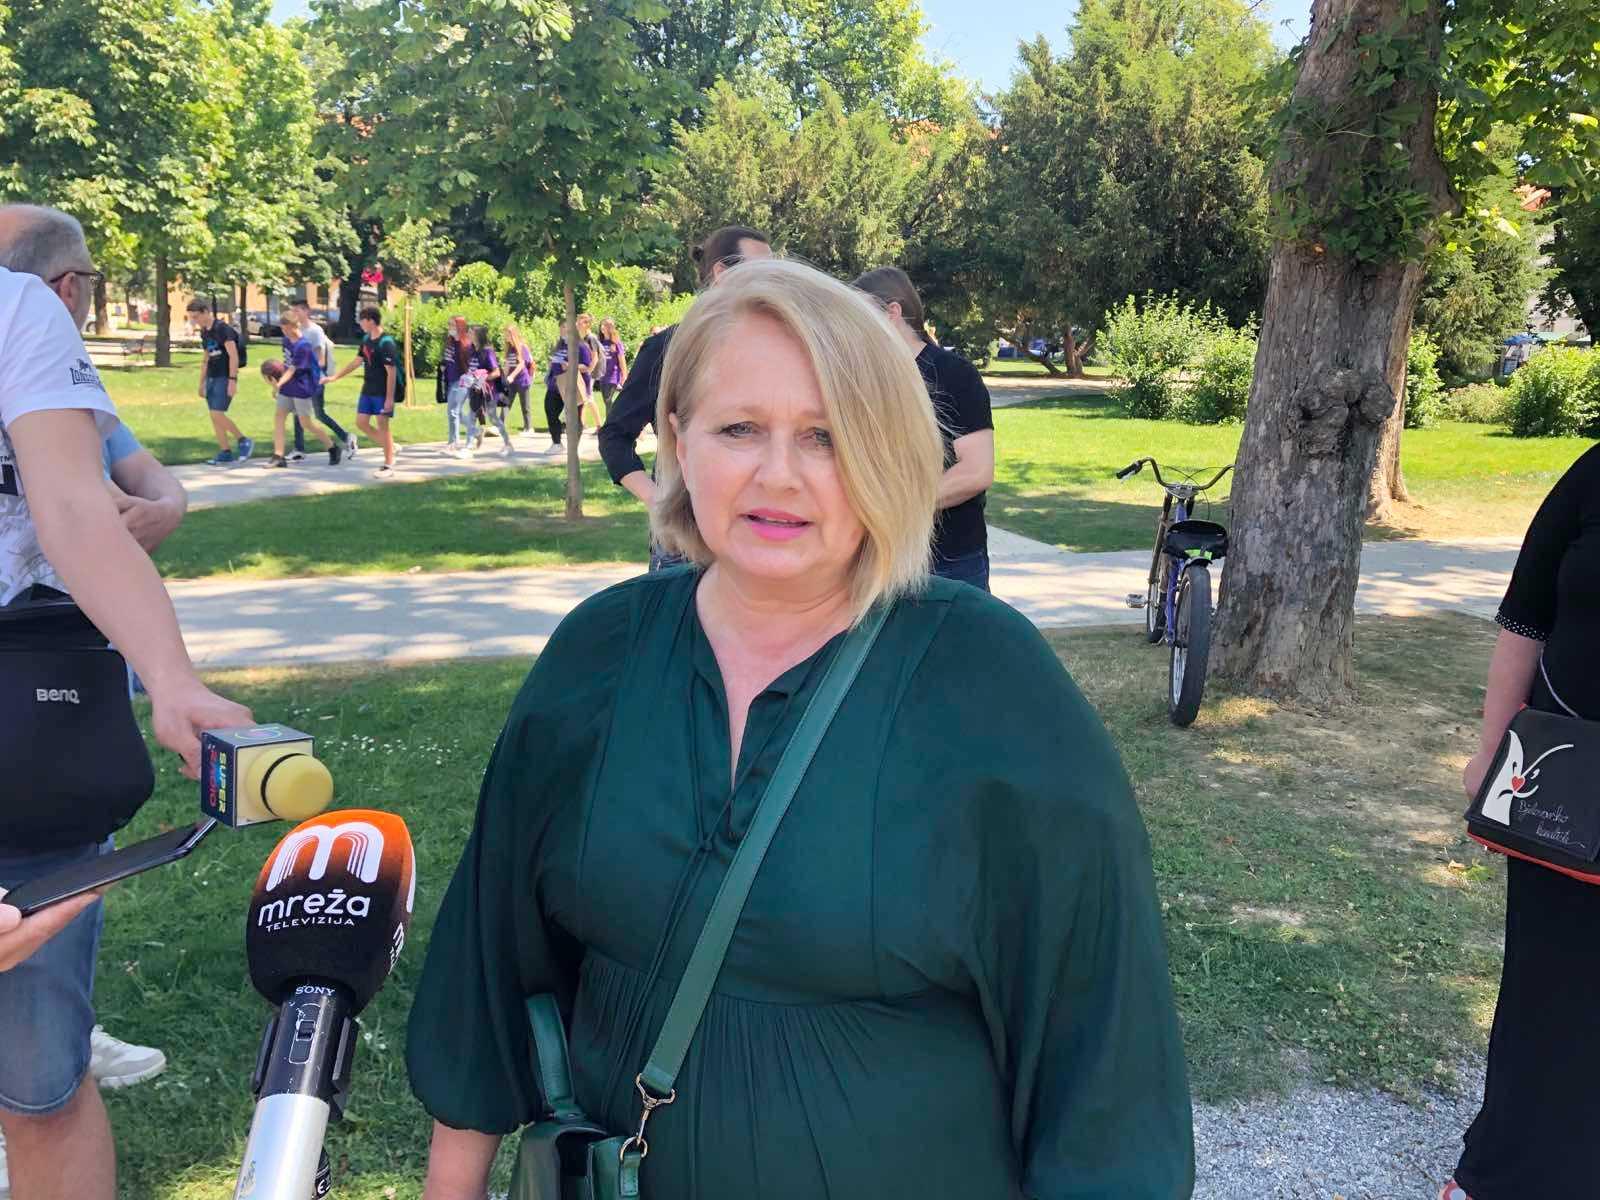 bjelovarsko kulturno ljeto 3